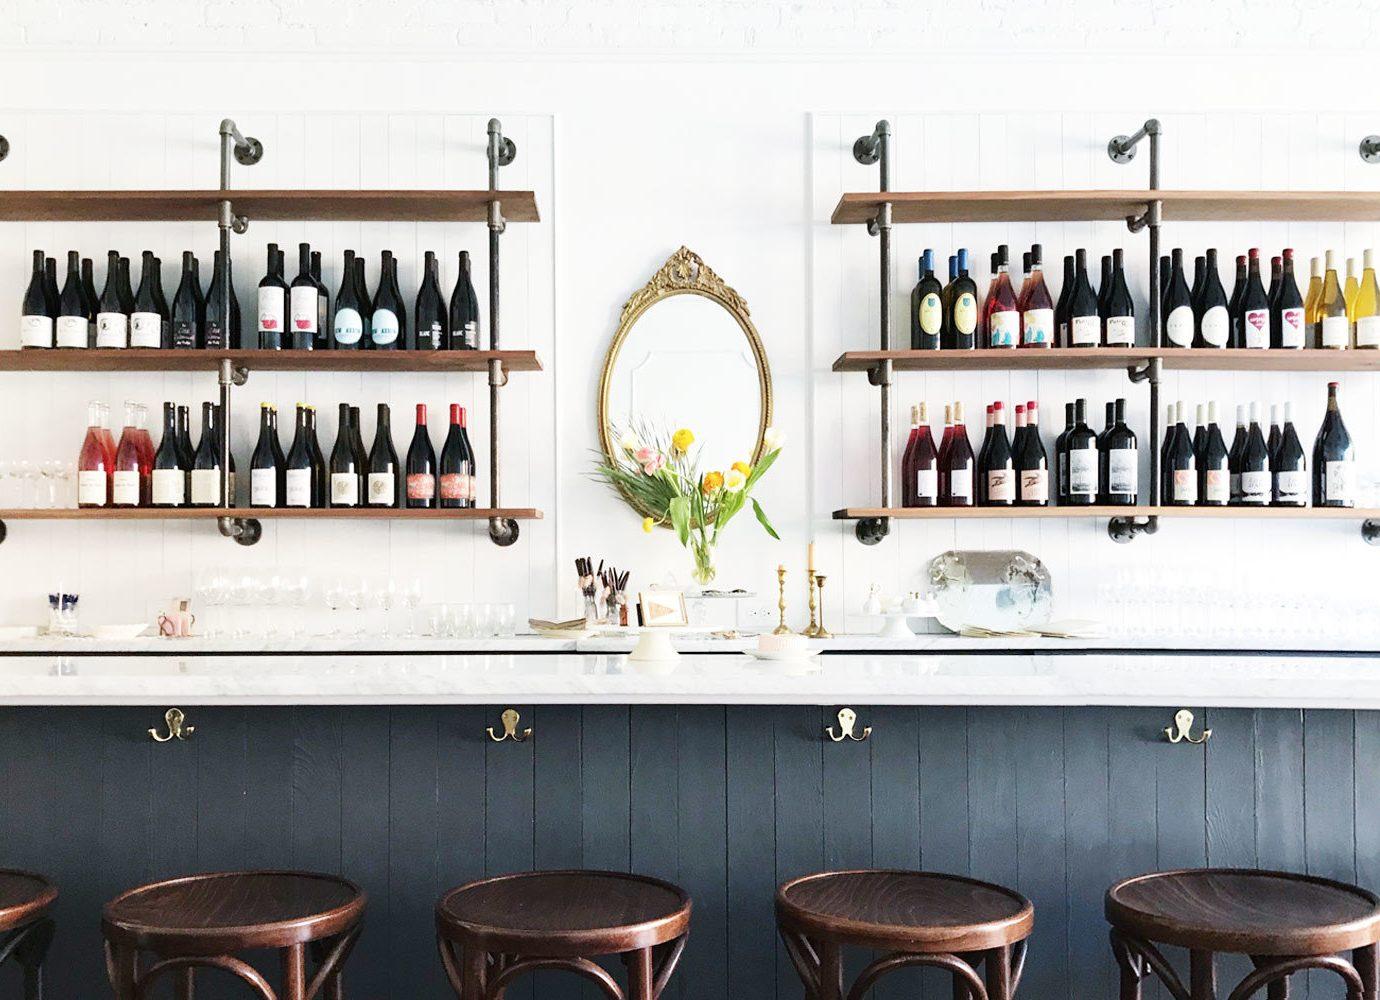 Food + Drink Romantic Getaways Weekend Getaways furniture product design table interior design